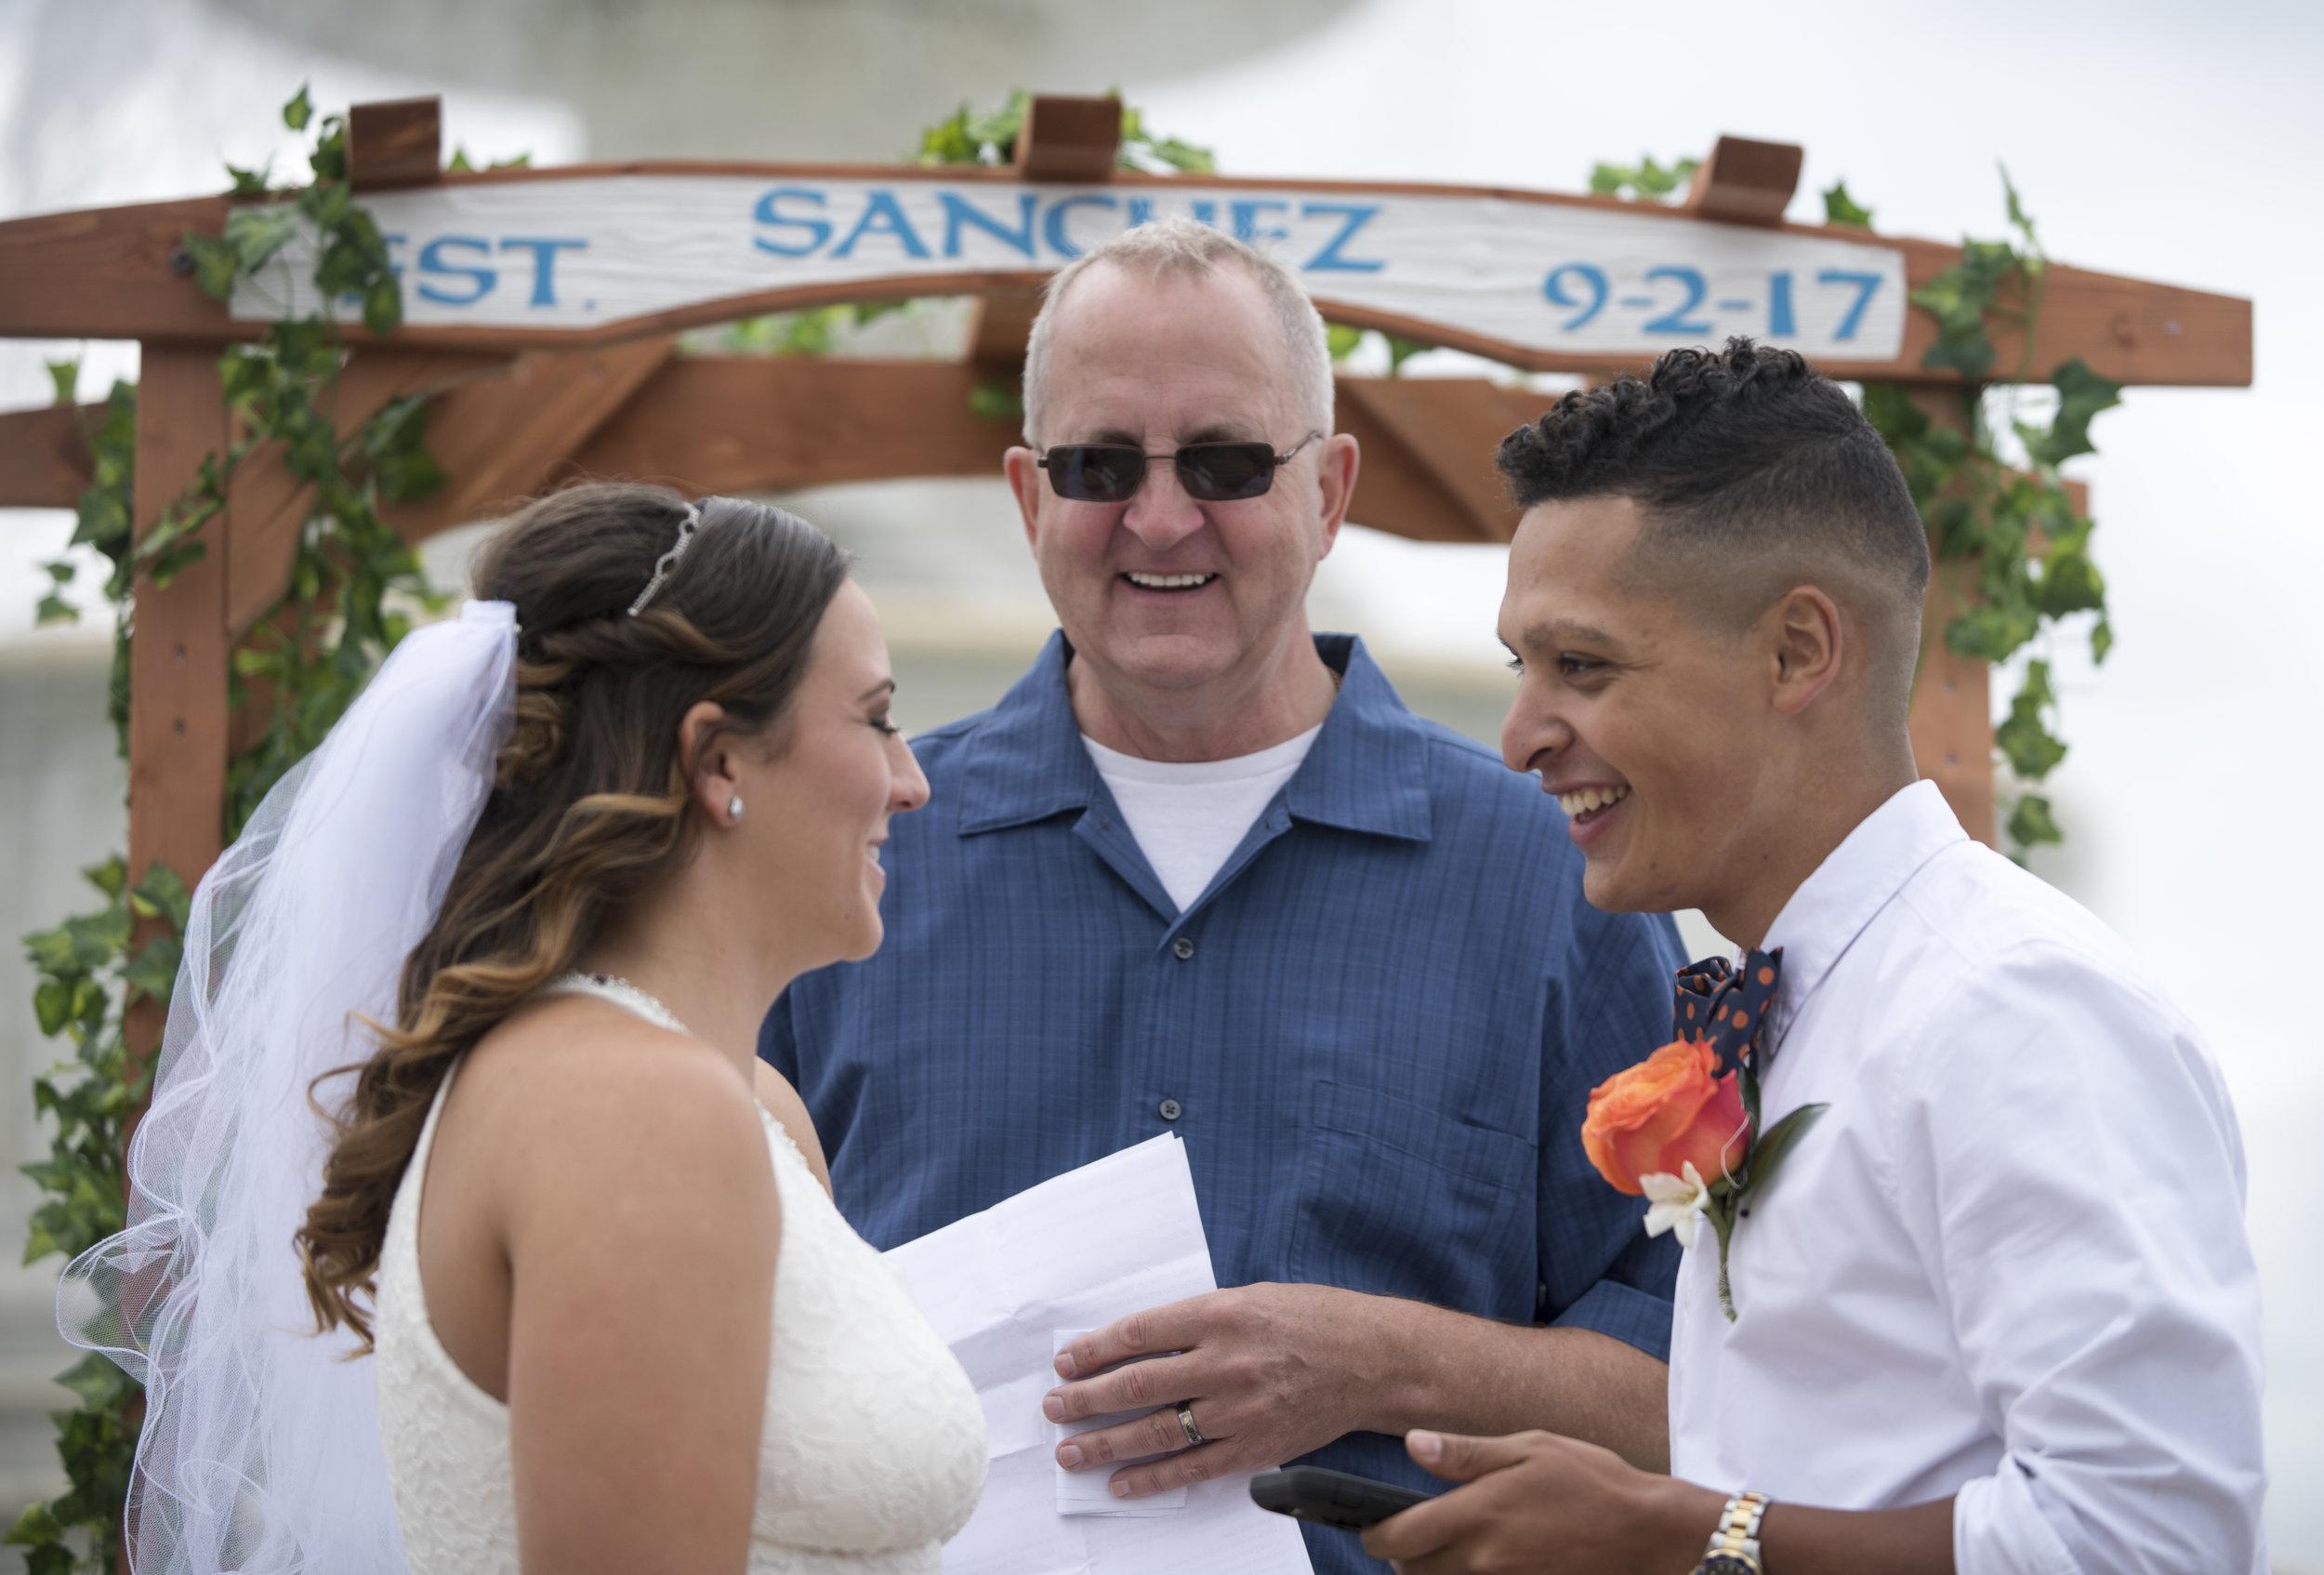 Sanchez wedding-7290.jpg